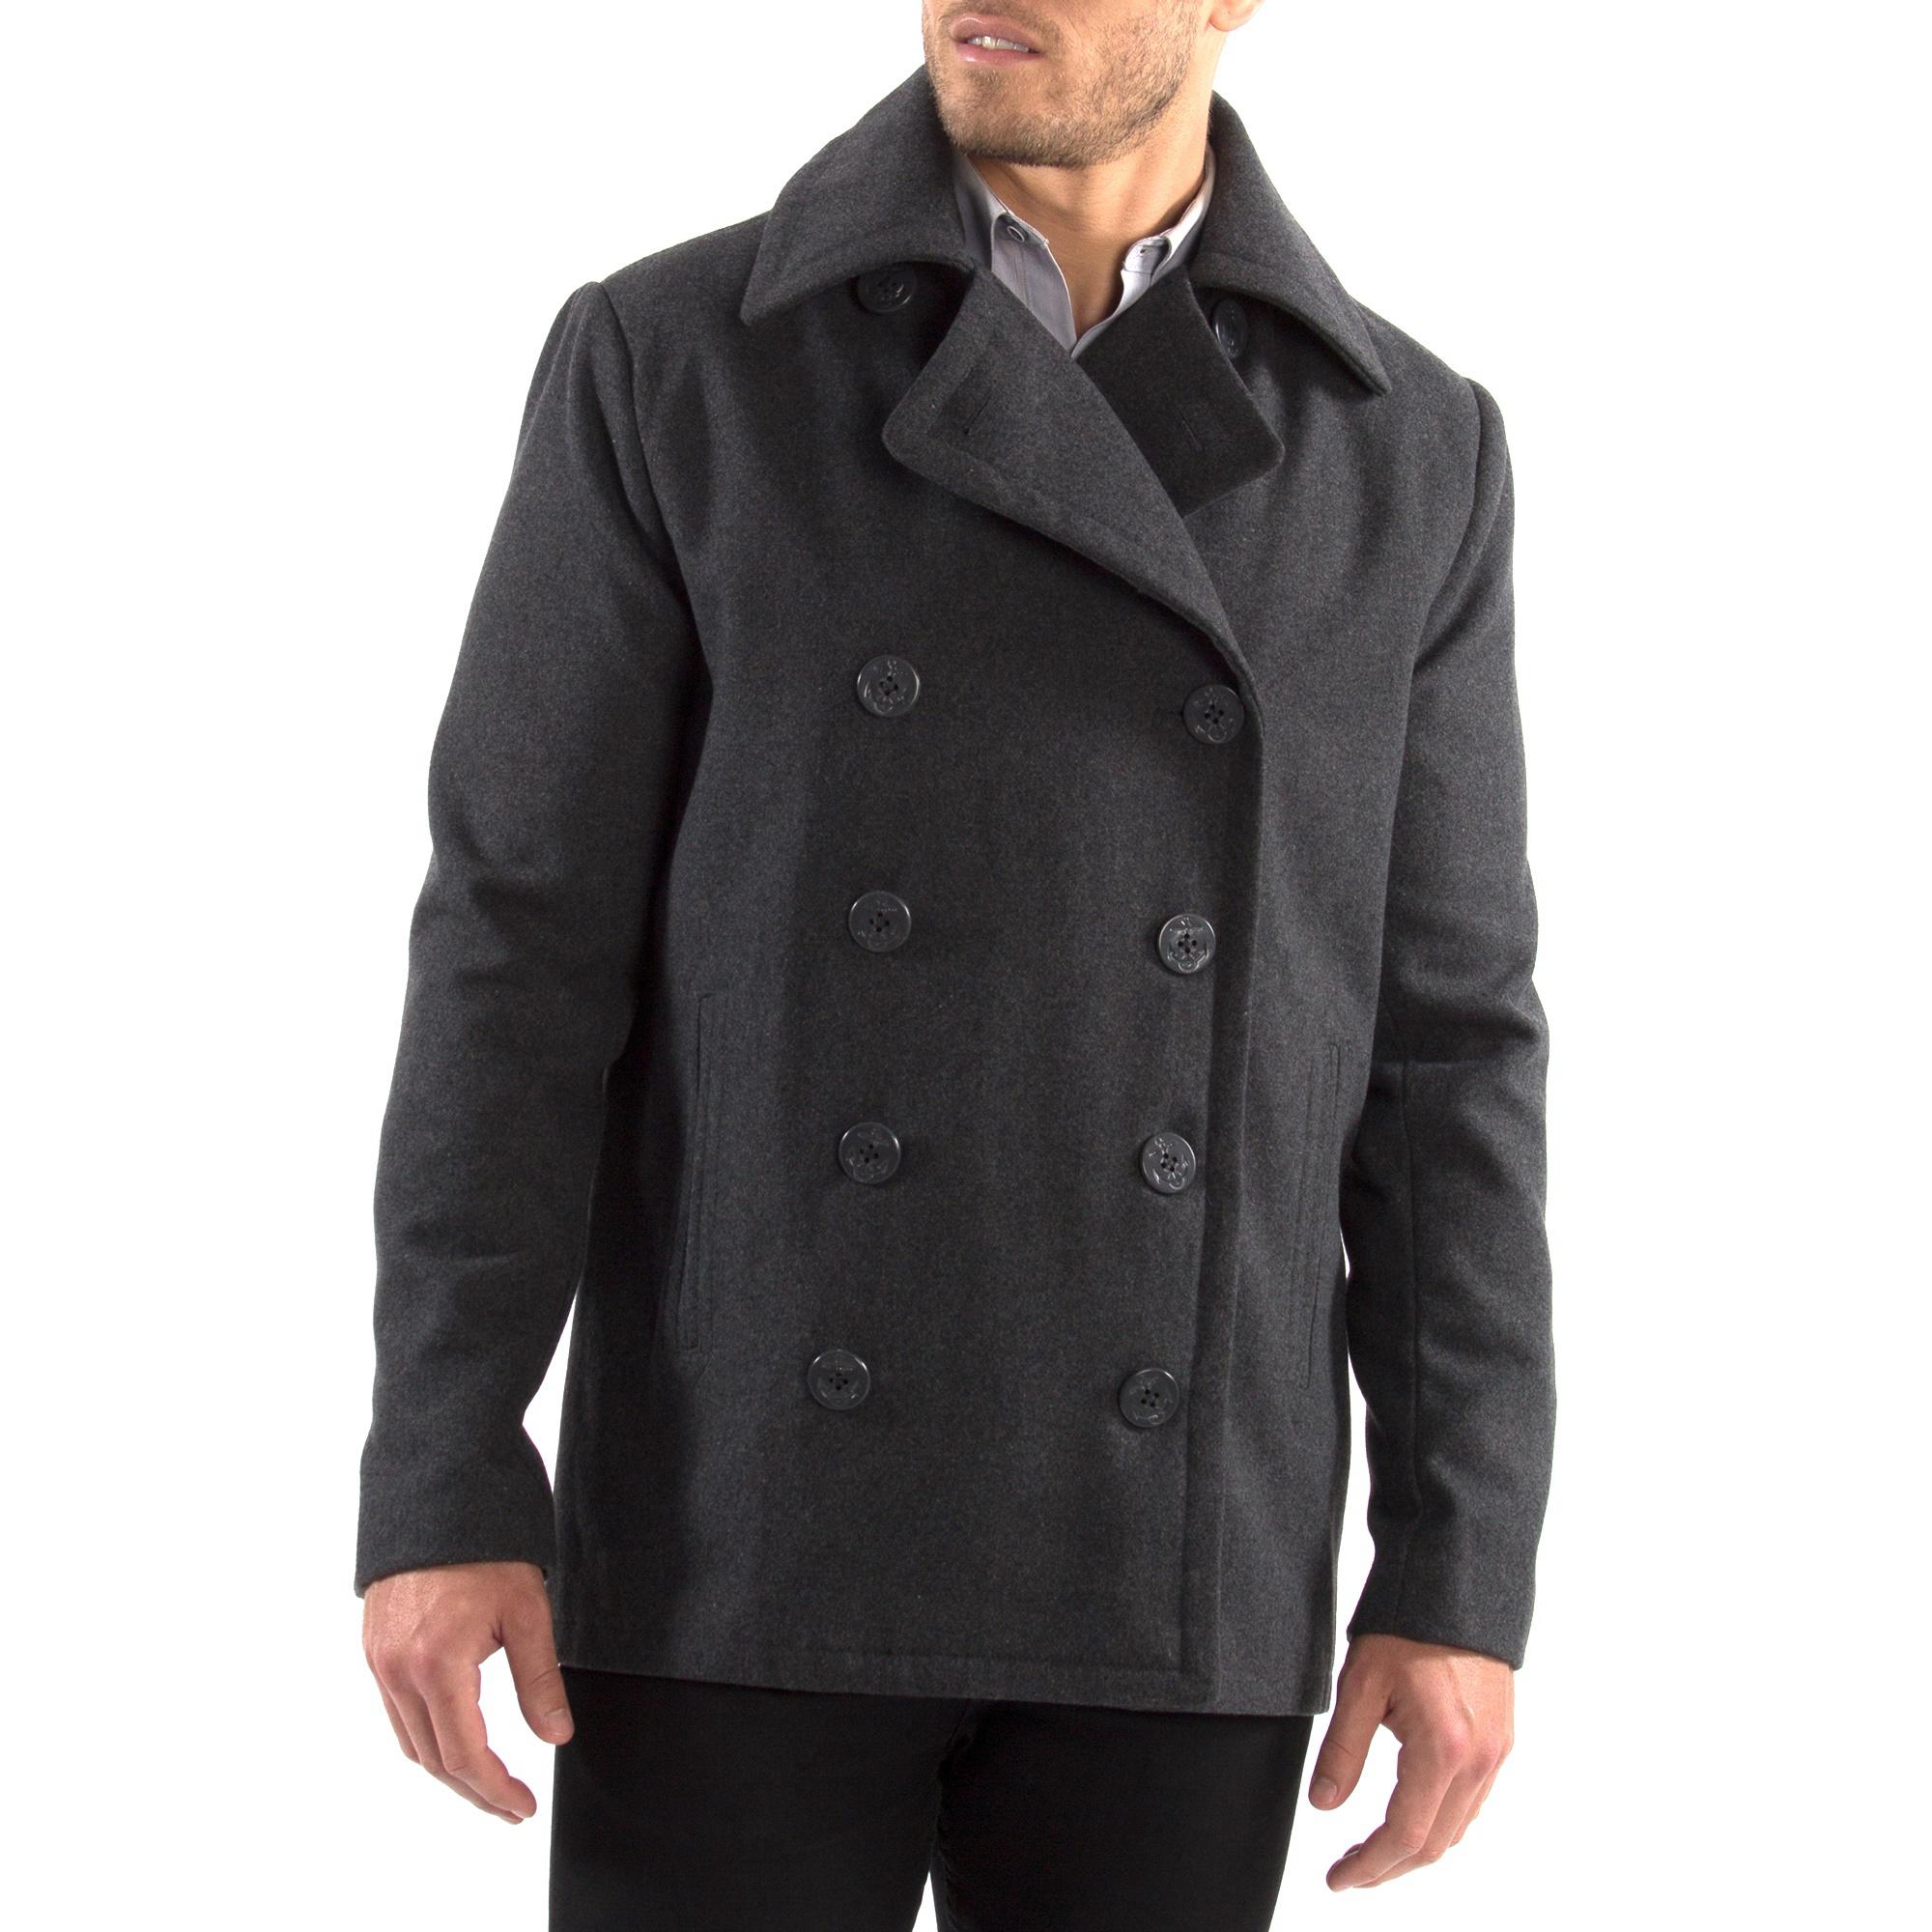 Alpine-Swiss-Mason-Mens-Wool-Blend-Pea-Coat-Jacket-Double-Breasted-Dress-Coat thumbnail 26